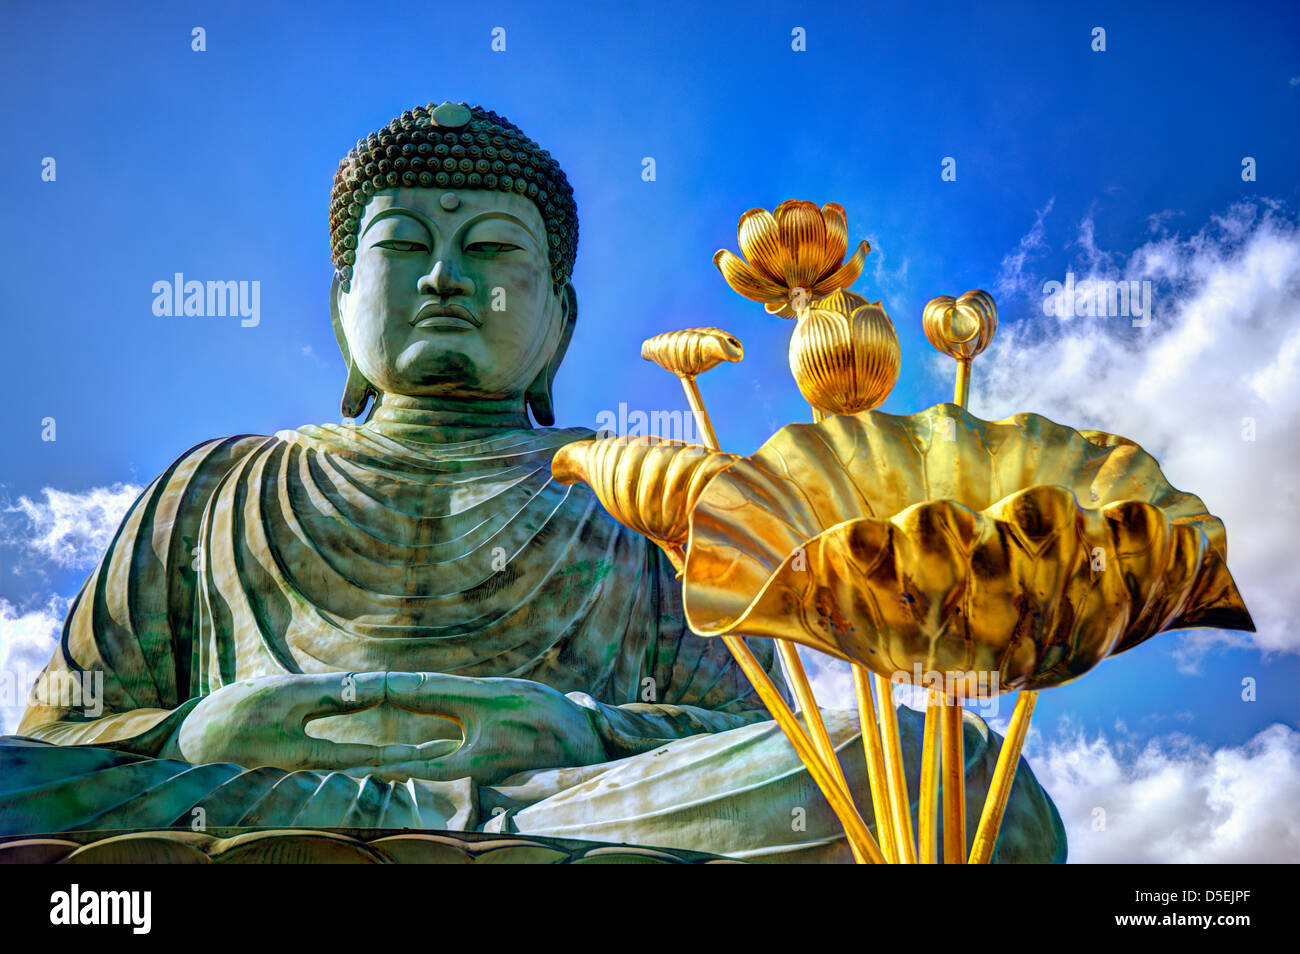 Grand Bouddha de Hyogo à Kobe, au Japon. Photo Stock